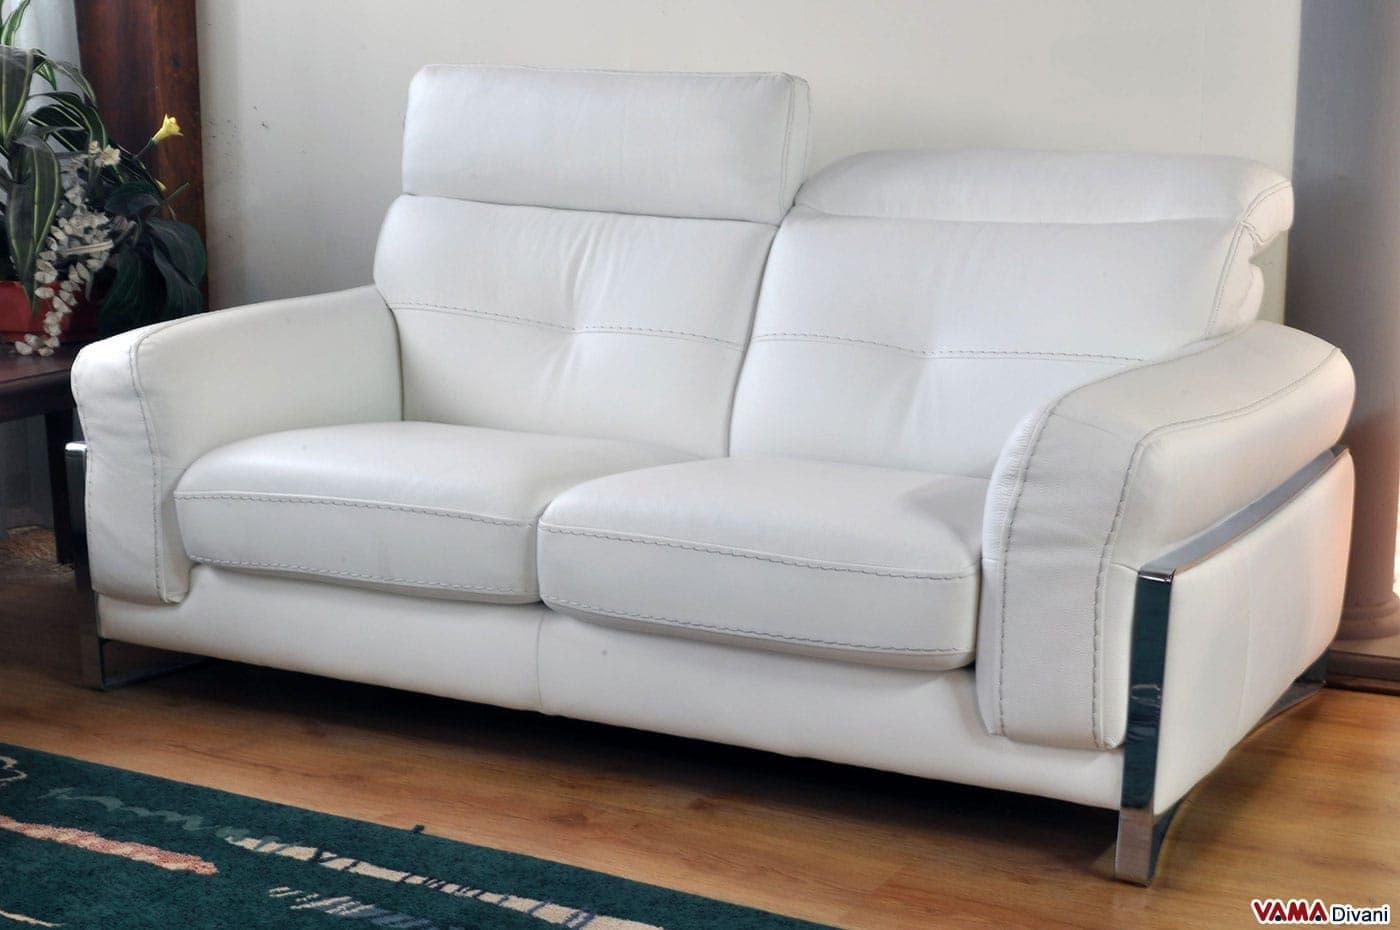 Offerta divano bianco tessy vama divani - Divano in pelle ikea ...